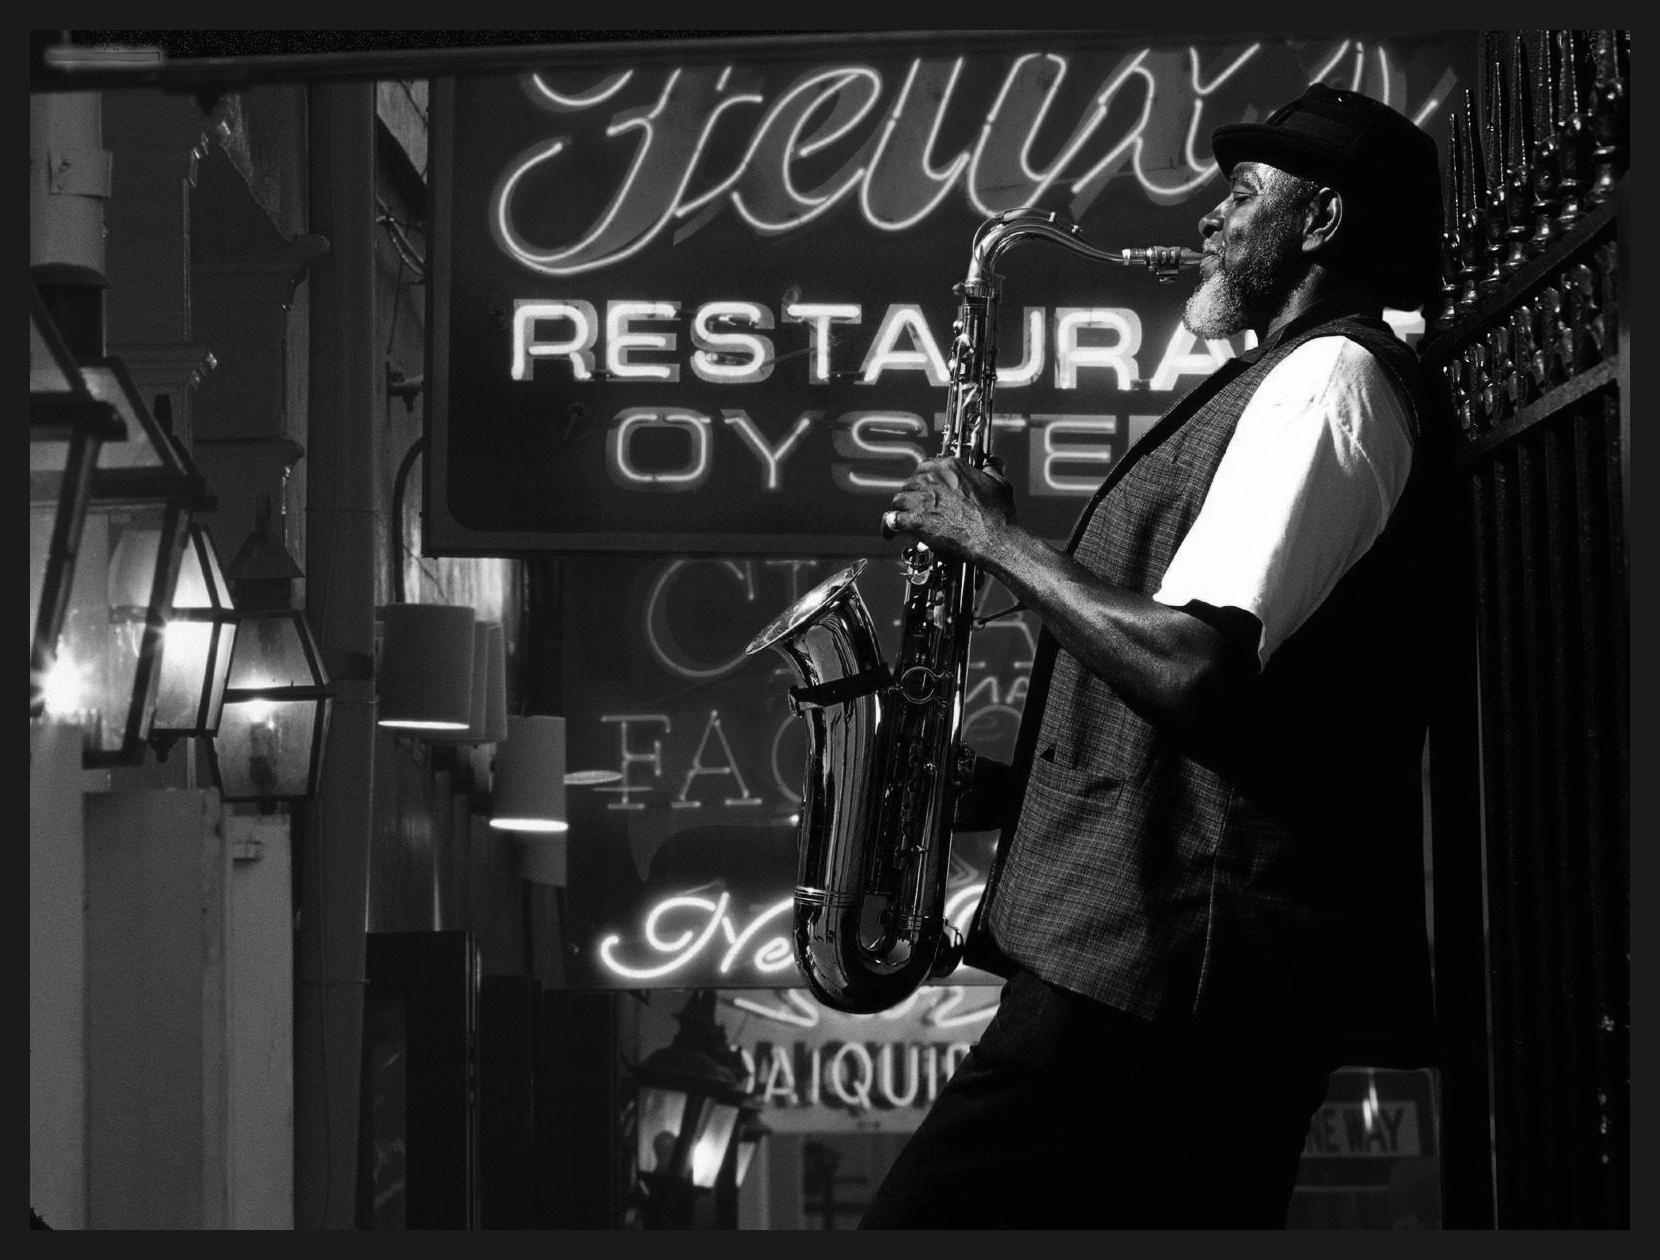 Bourbon_Street_New_Orleans_Louisiana.jpg